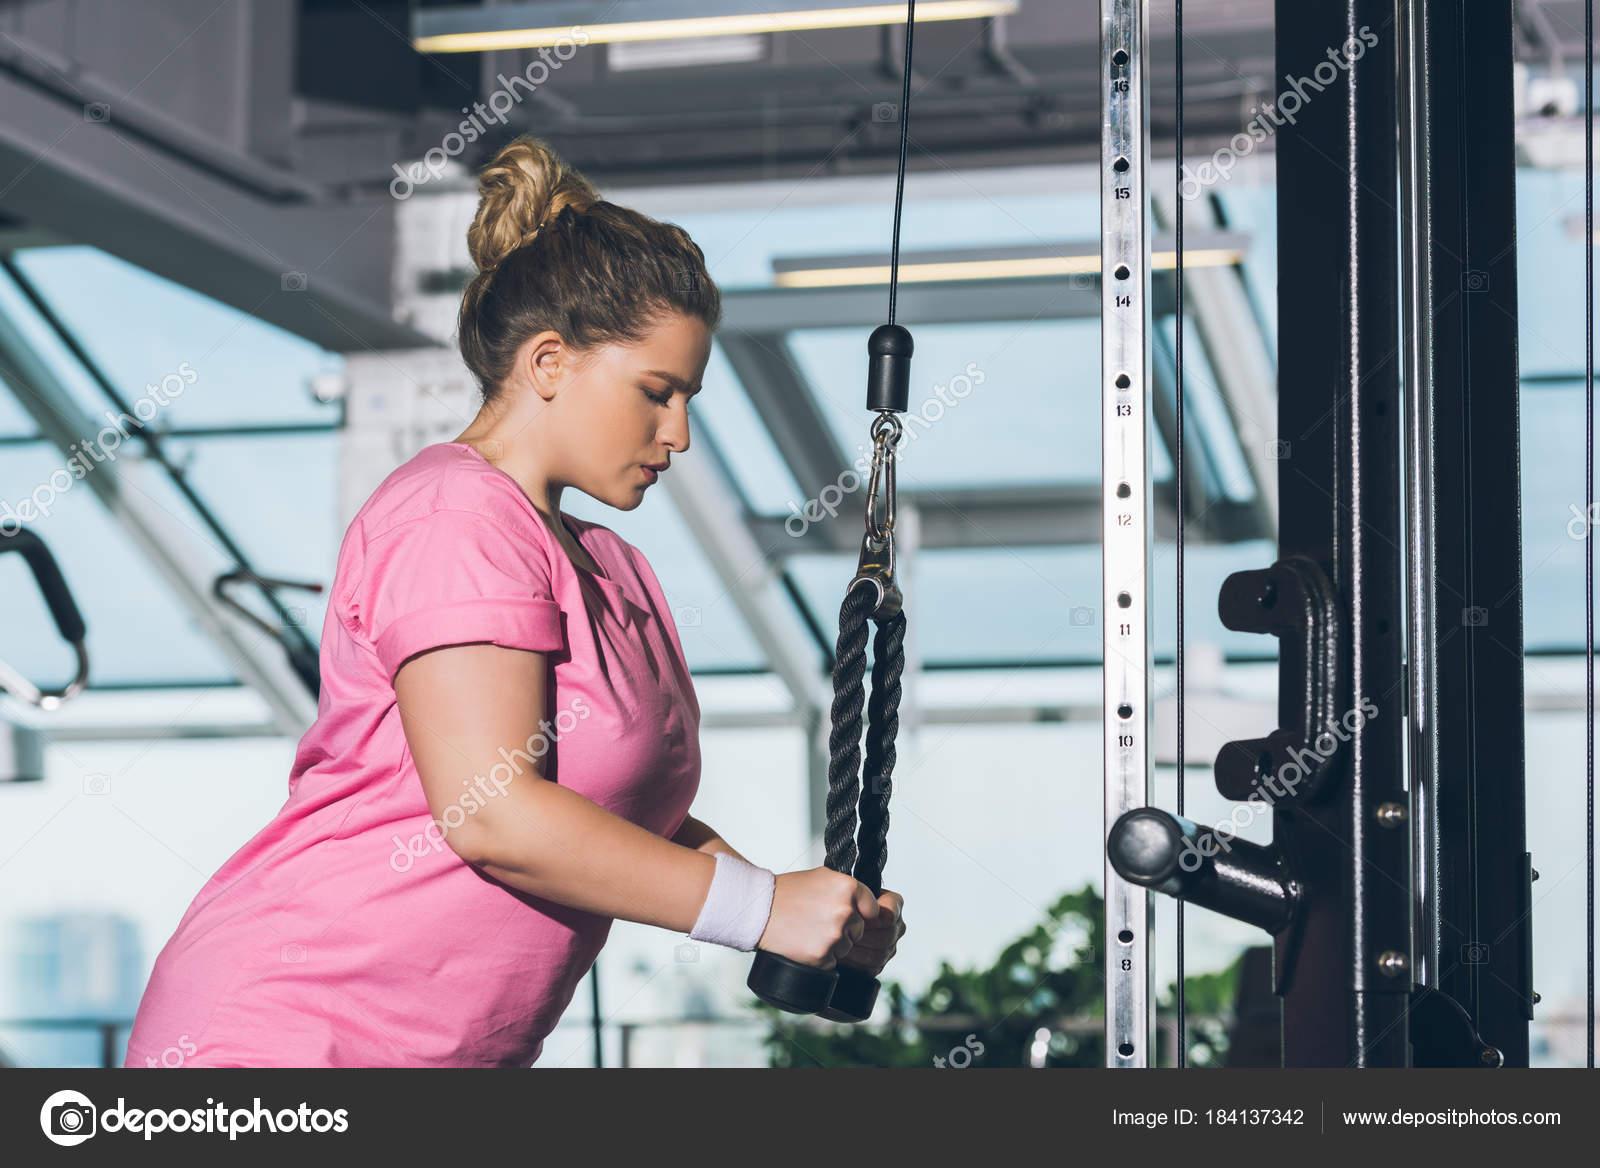 Overweight Woman Working Out Training Apparatus Stock Photo C Igorvetushko 184137342